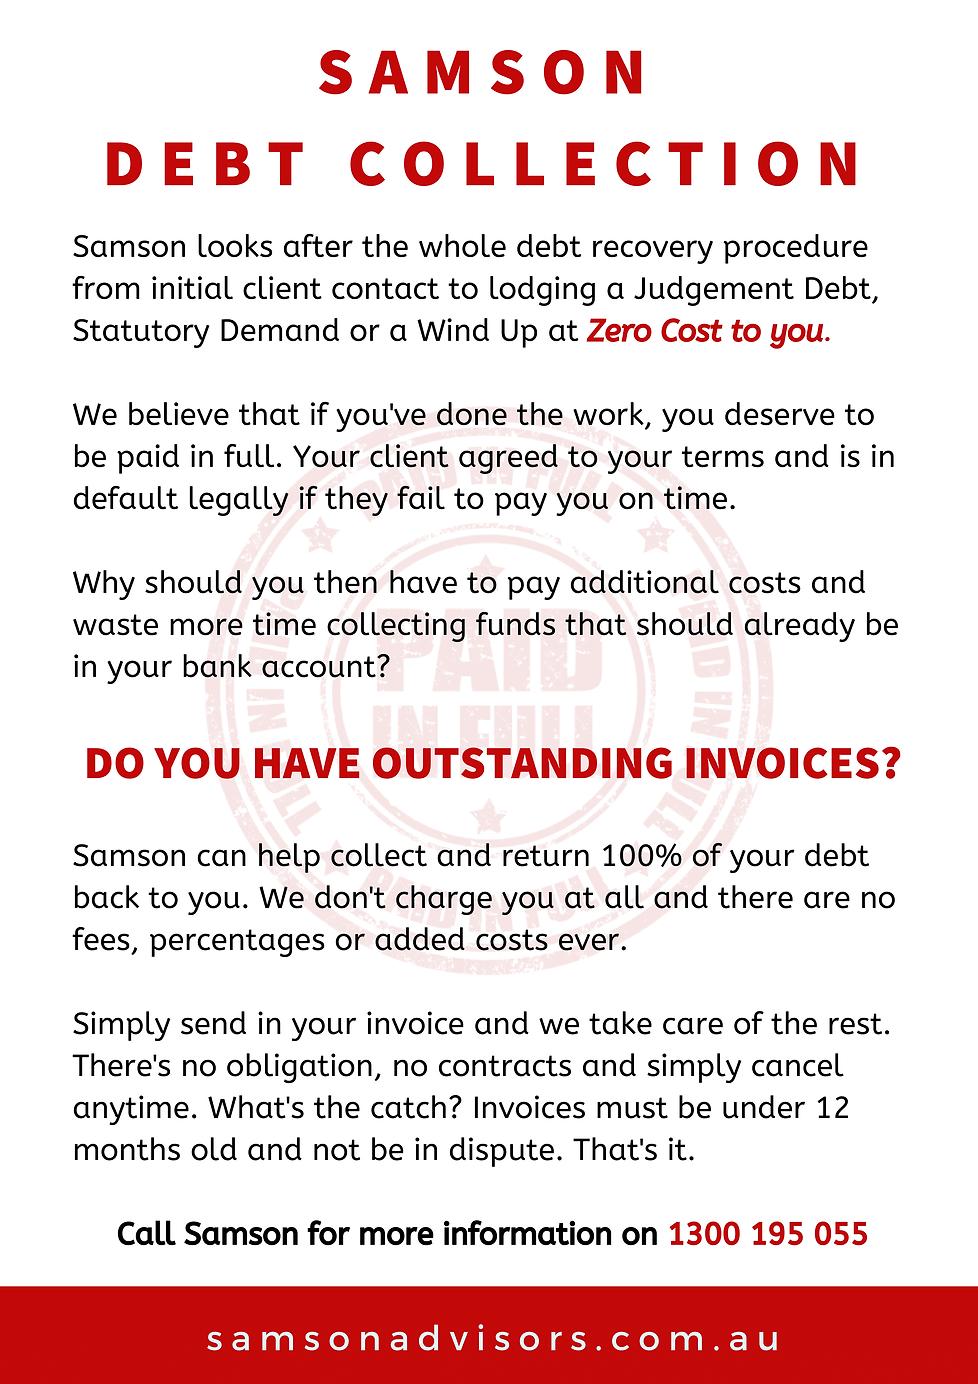 Samson Advisors Debt Collection 2 (1).pn